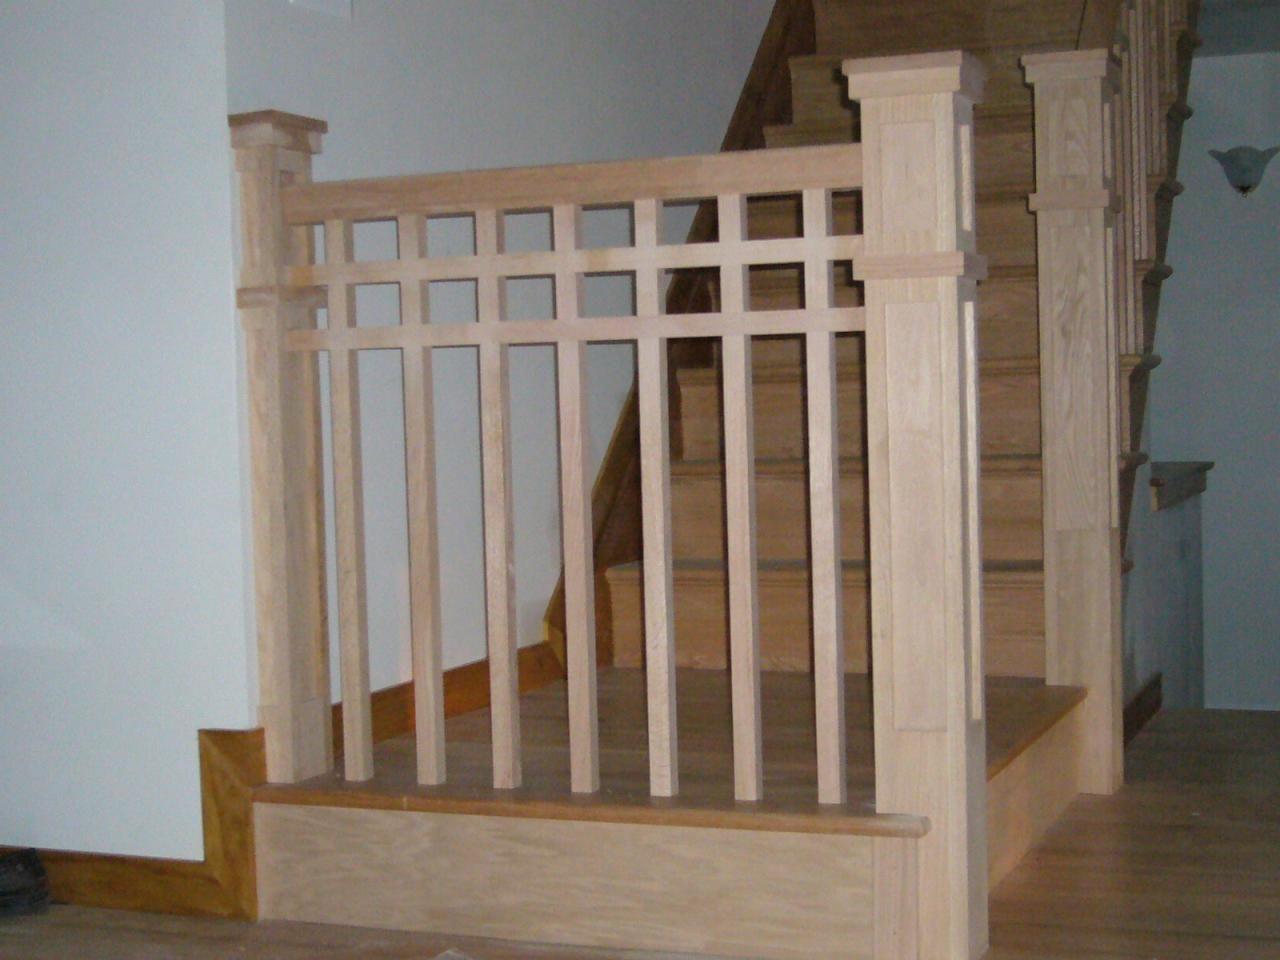 Craftsman Stair Railings | Stairs & Rails - Portfolio ...